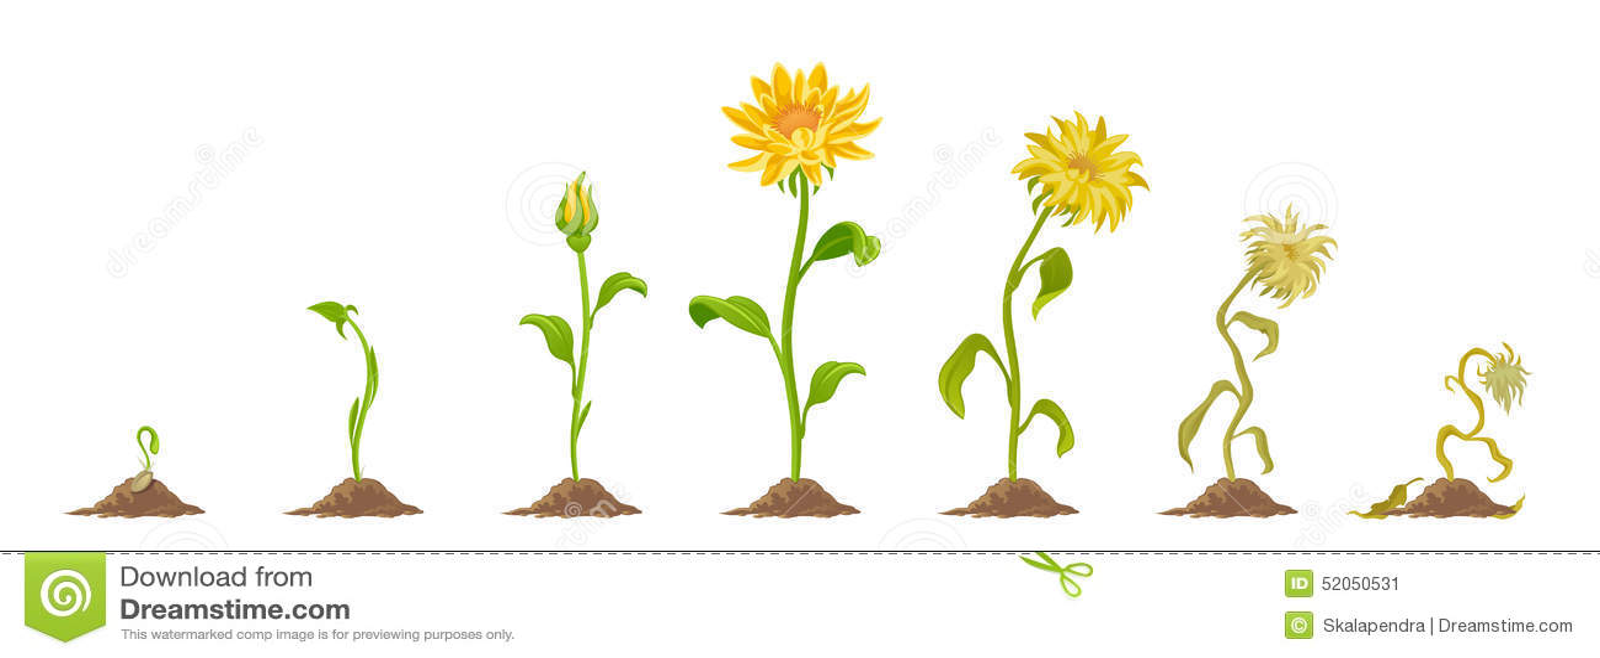 Stock De Ilustraci%C3%B3n Flor Image52050531 on Plant Life Cycle Clip Art